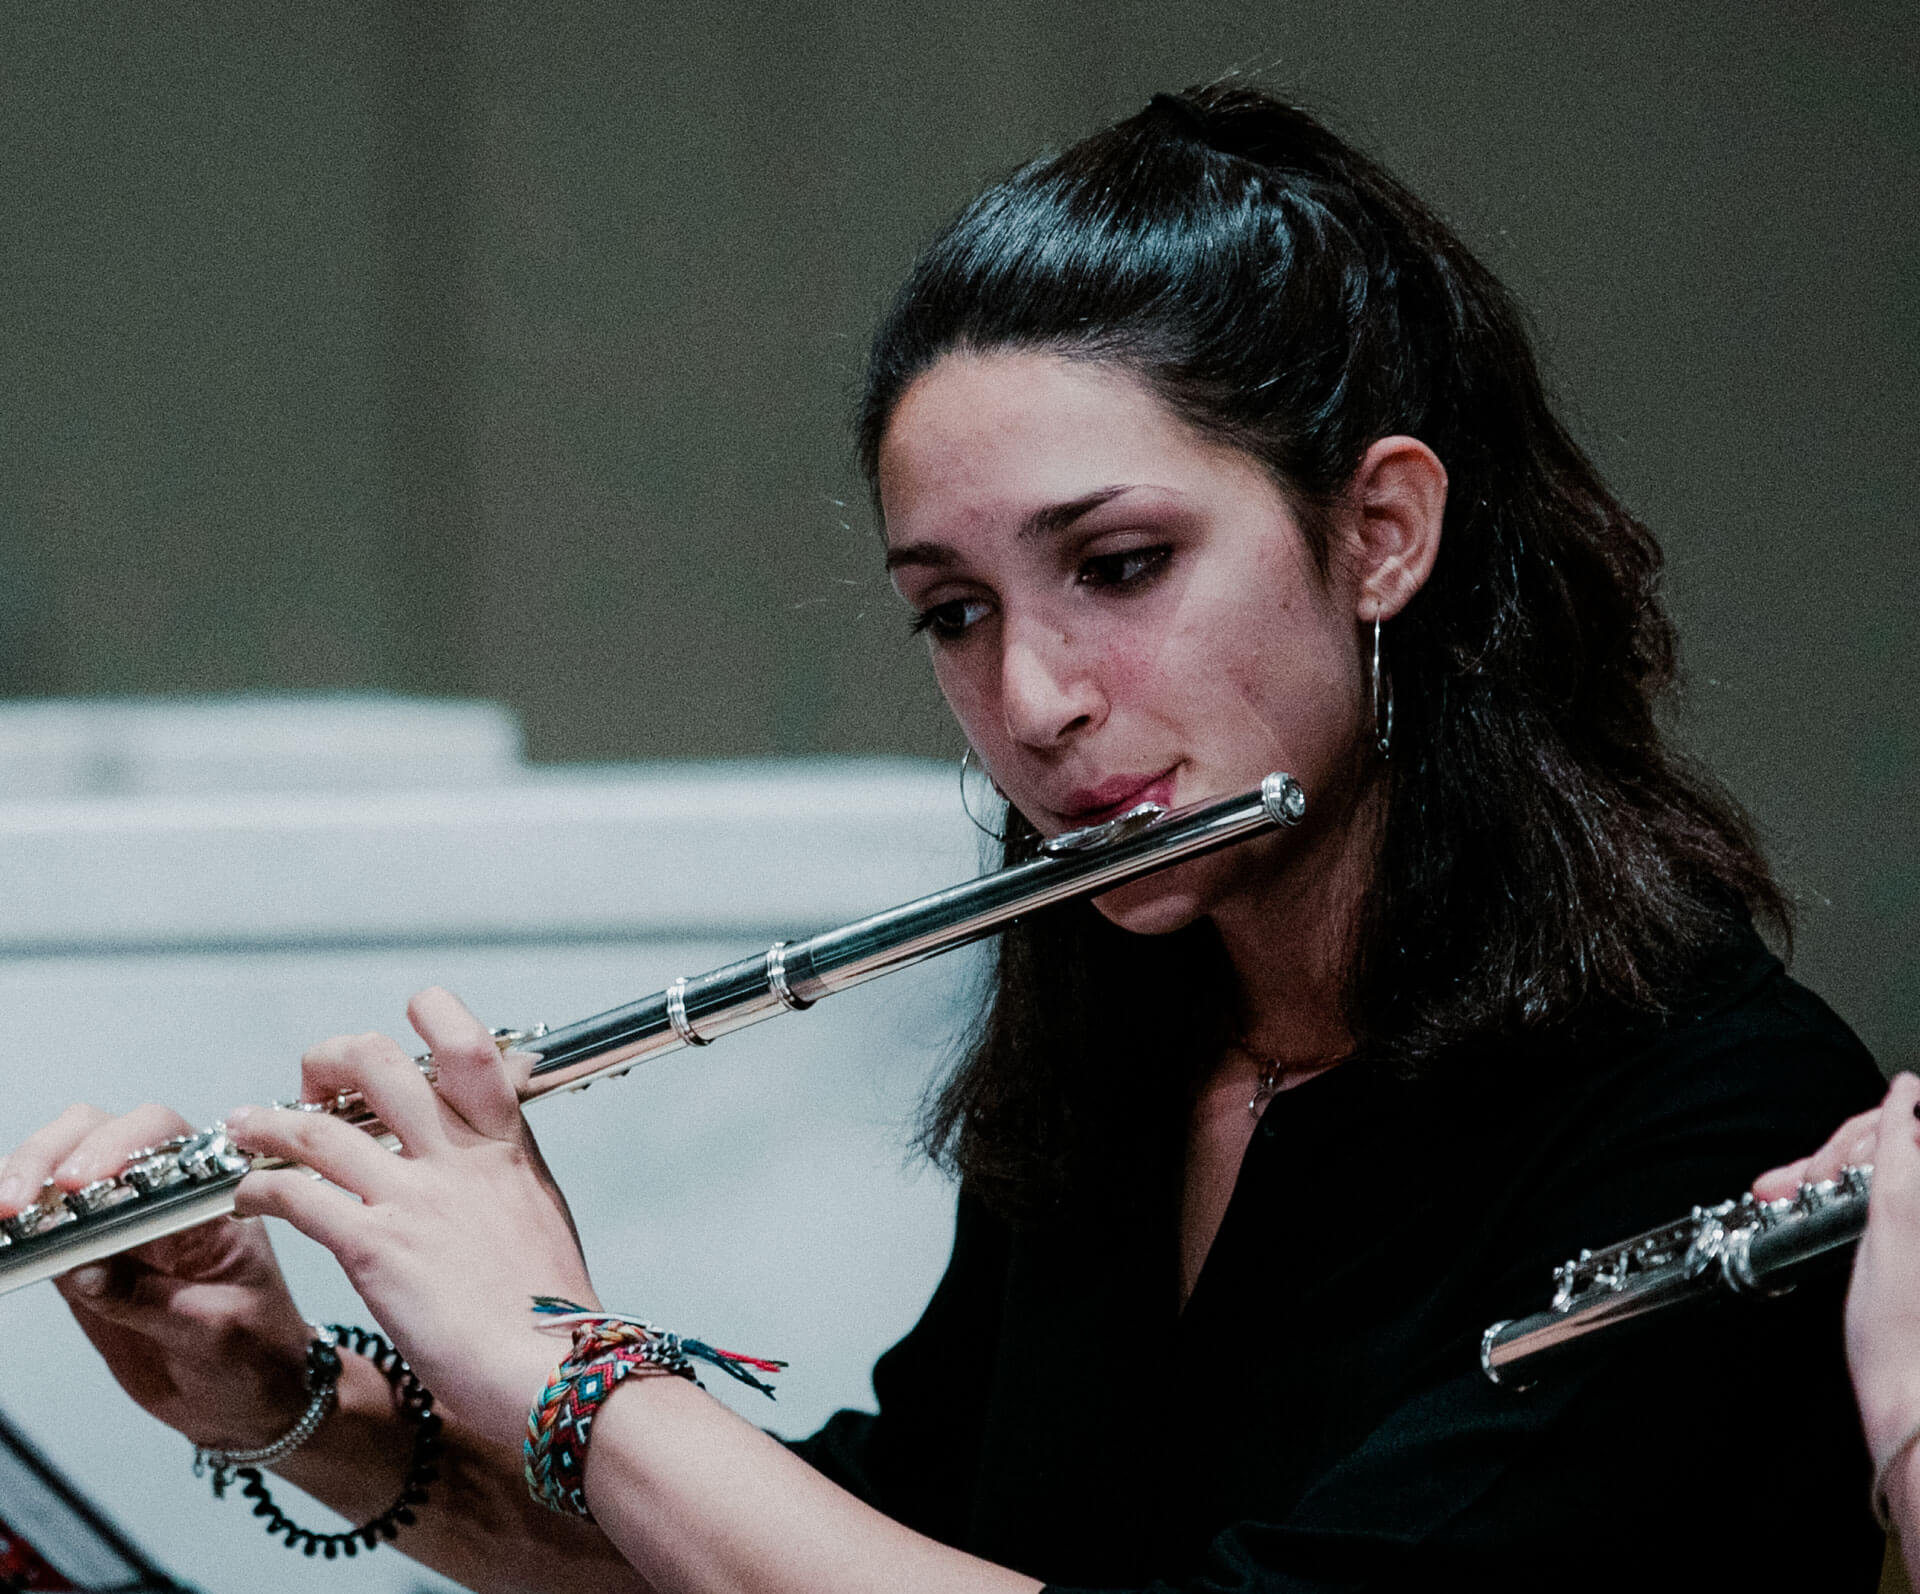 Virginia Lazzara